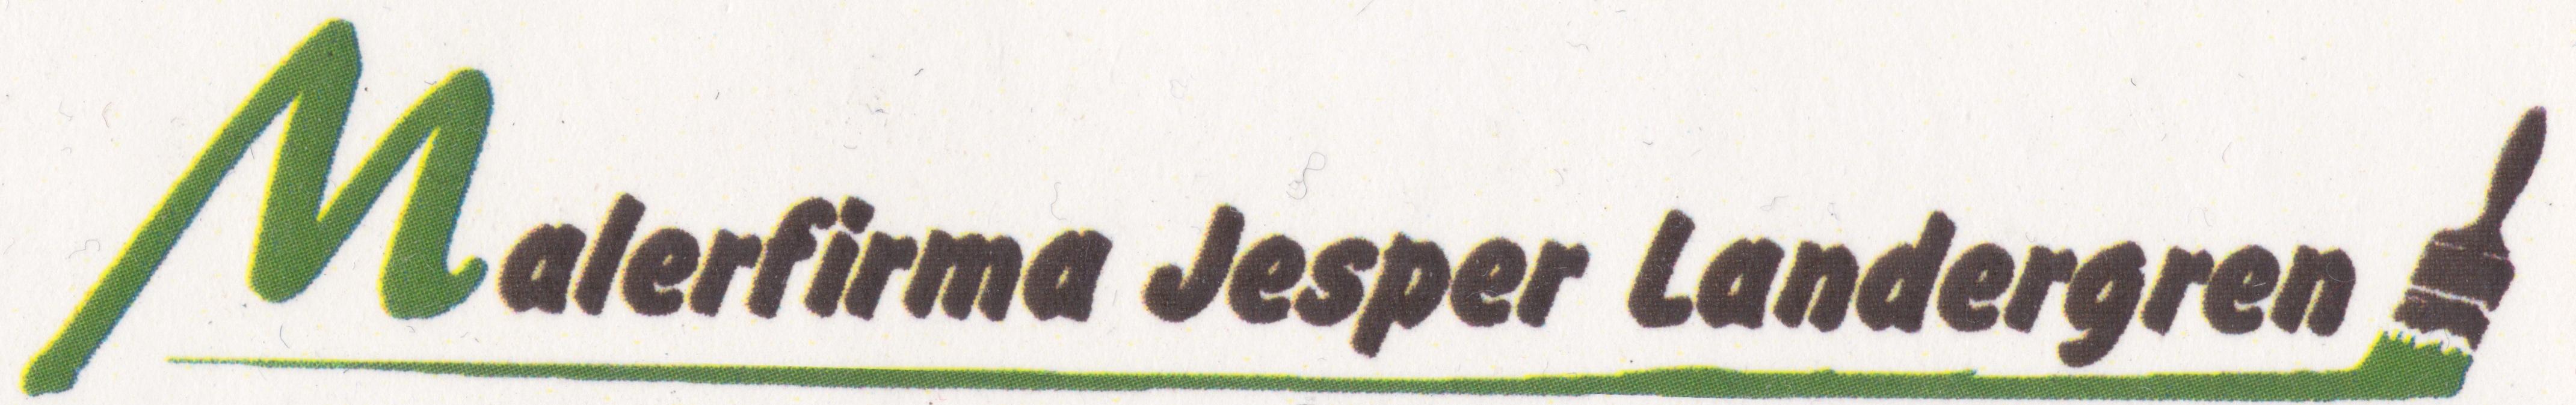 Malerfirma Jesper Landergren